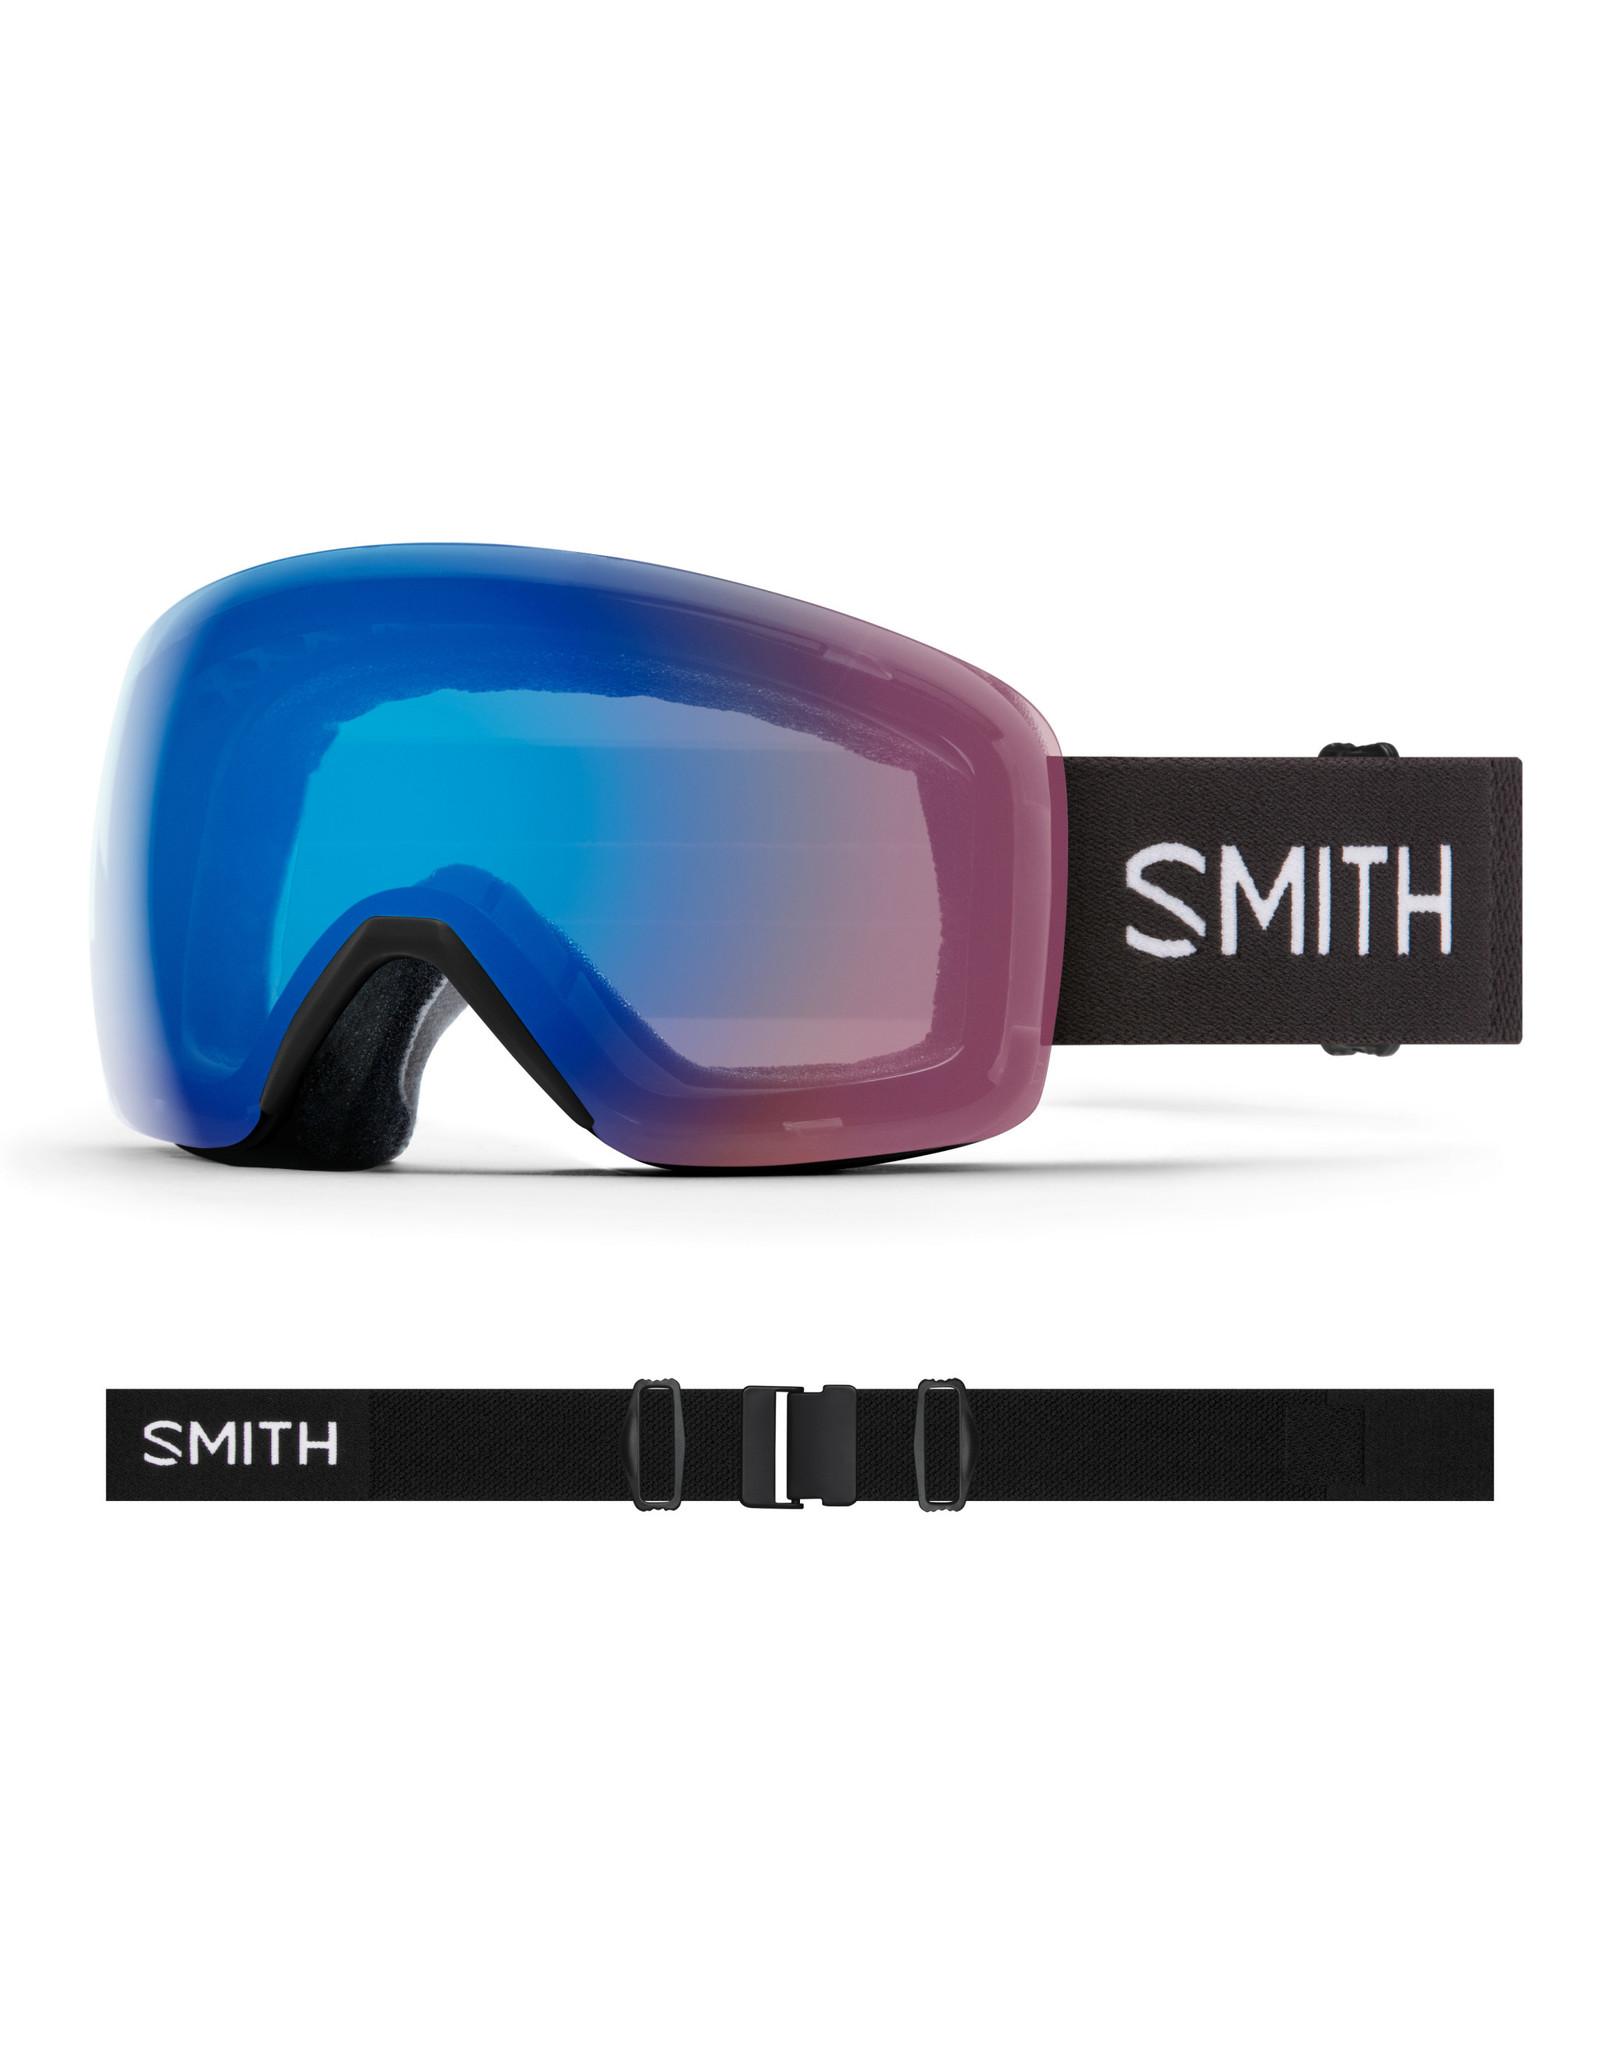 Smith SMITH SKYLINE BLACK 20 LUNETTES DE SKI